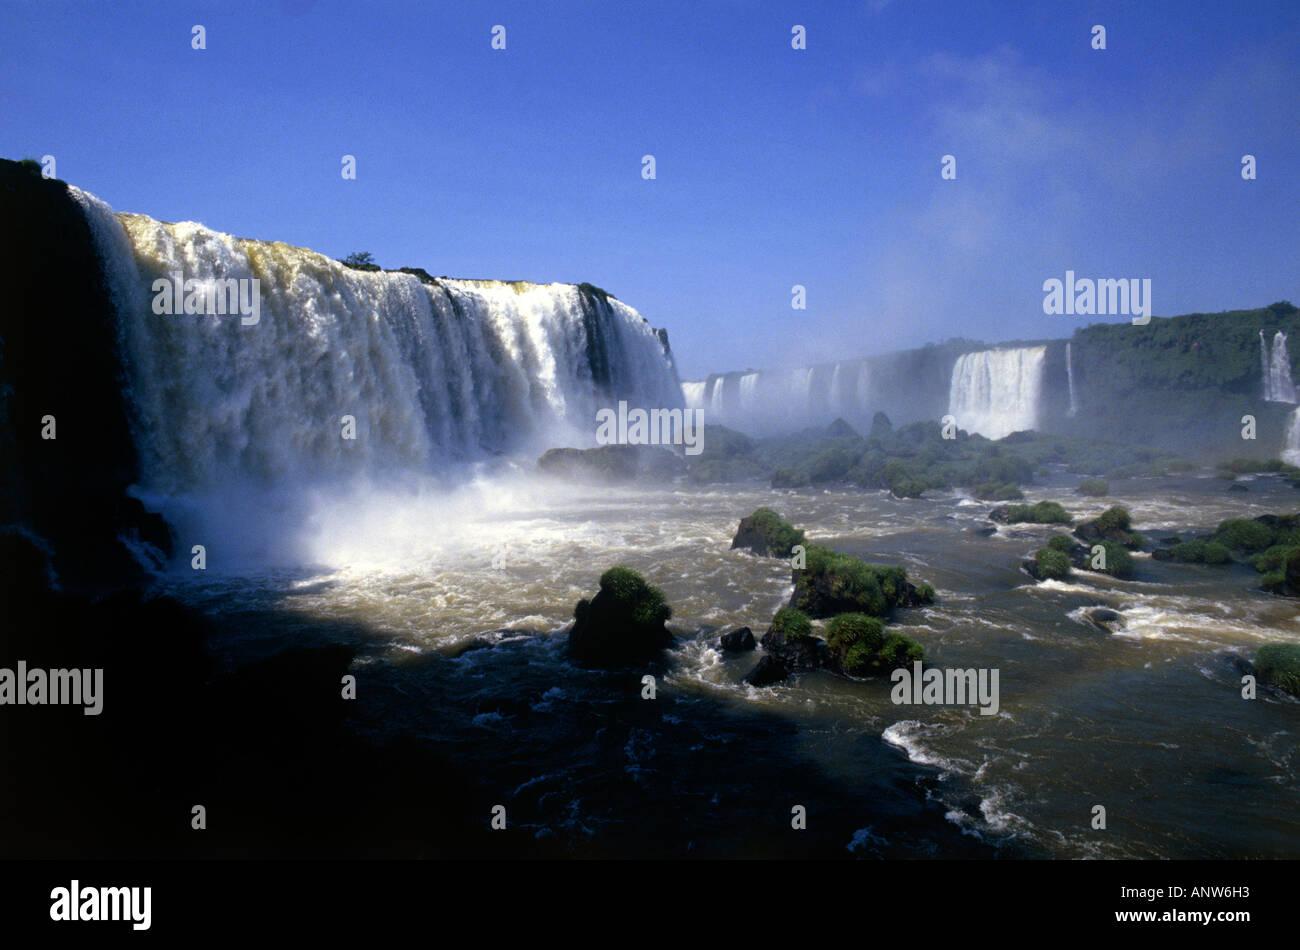 iguacu falls state of parana brazil - Stock Image